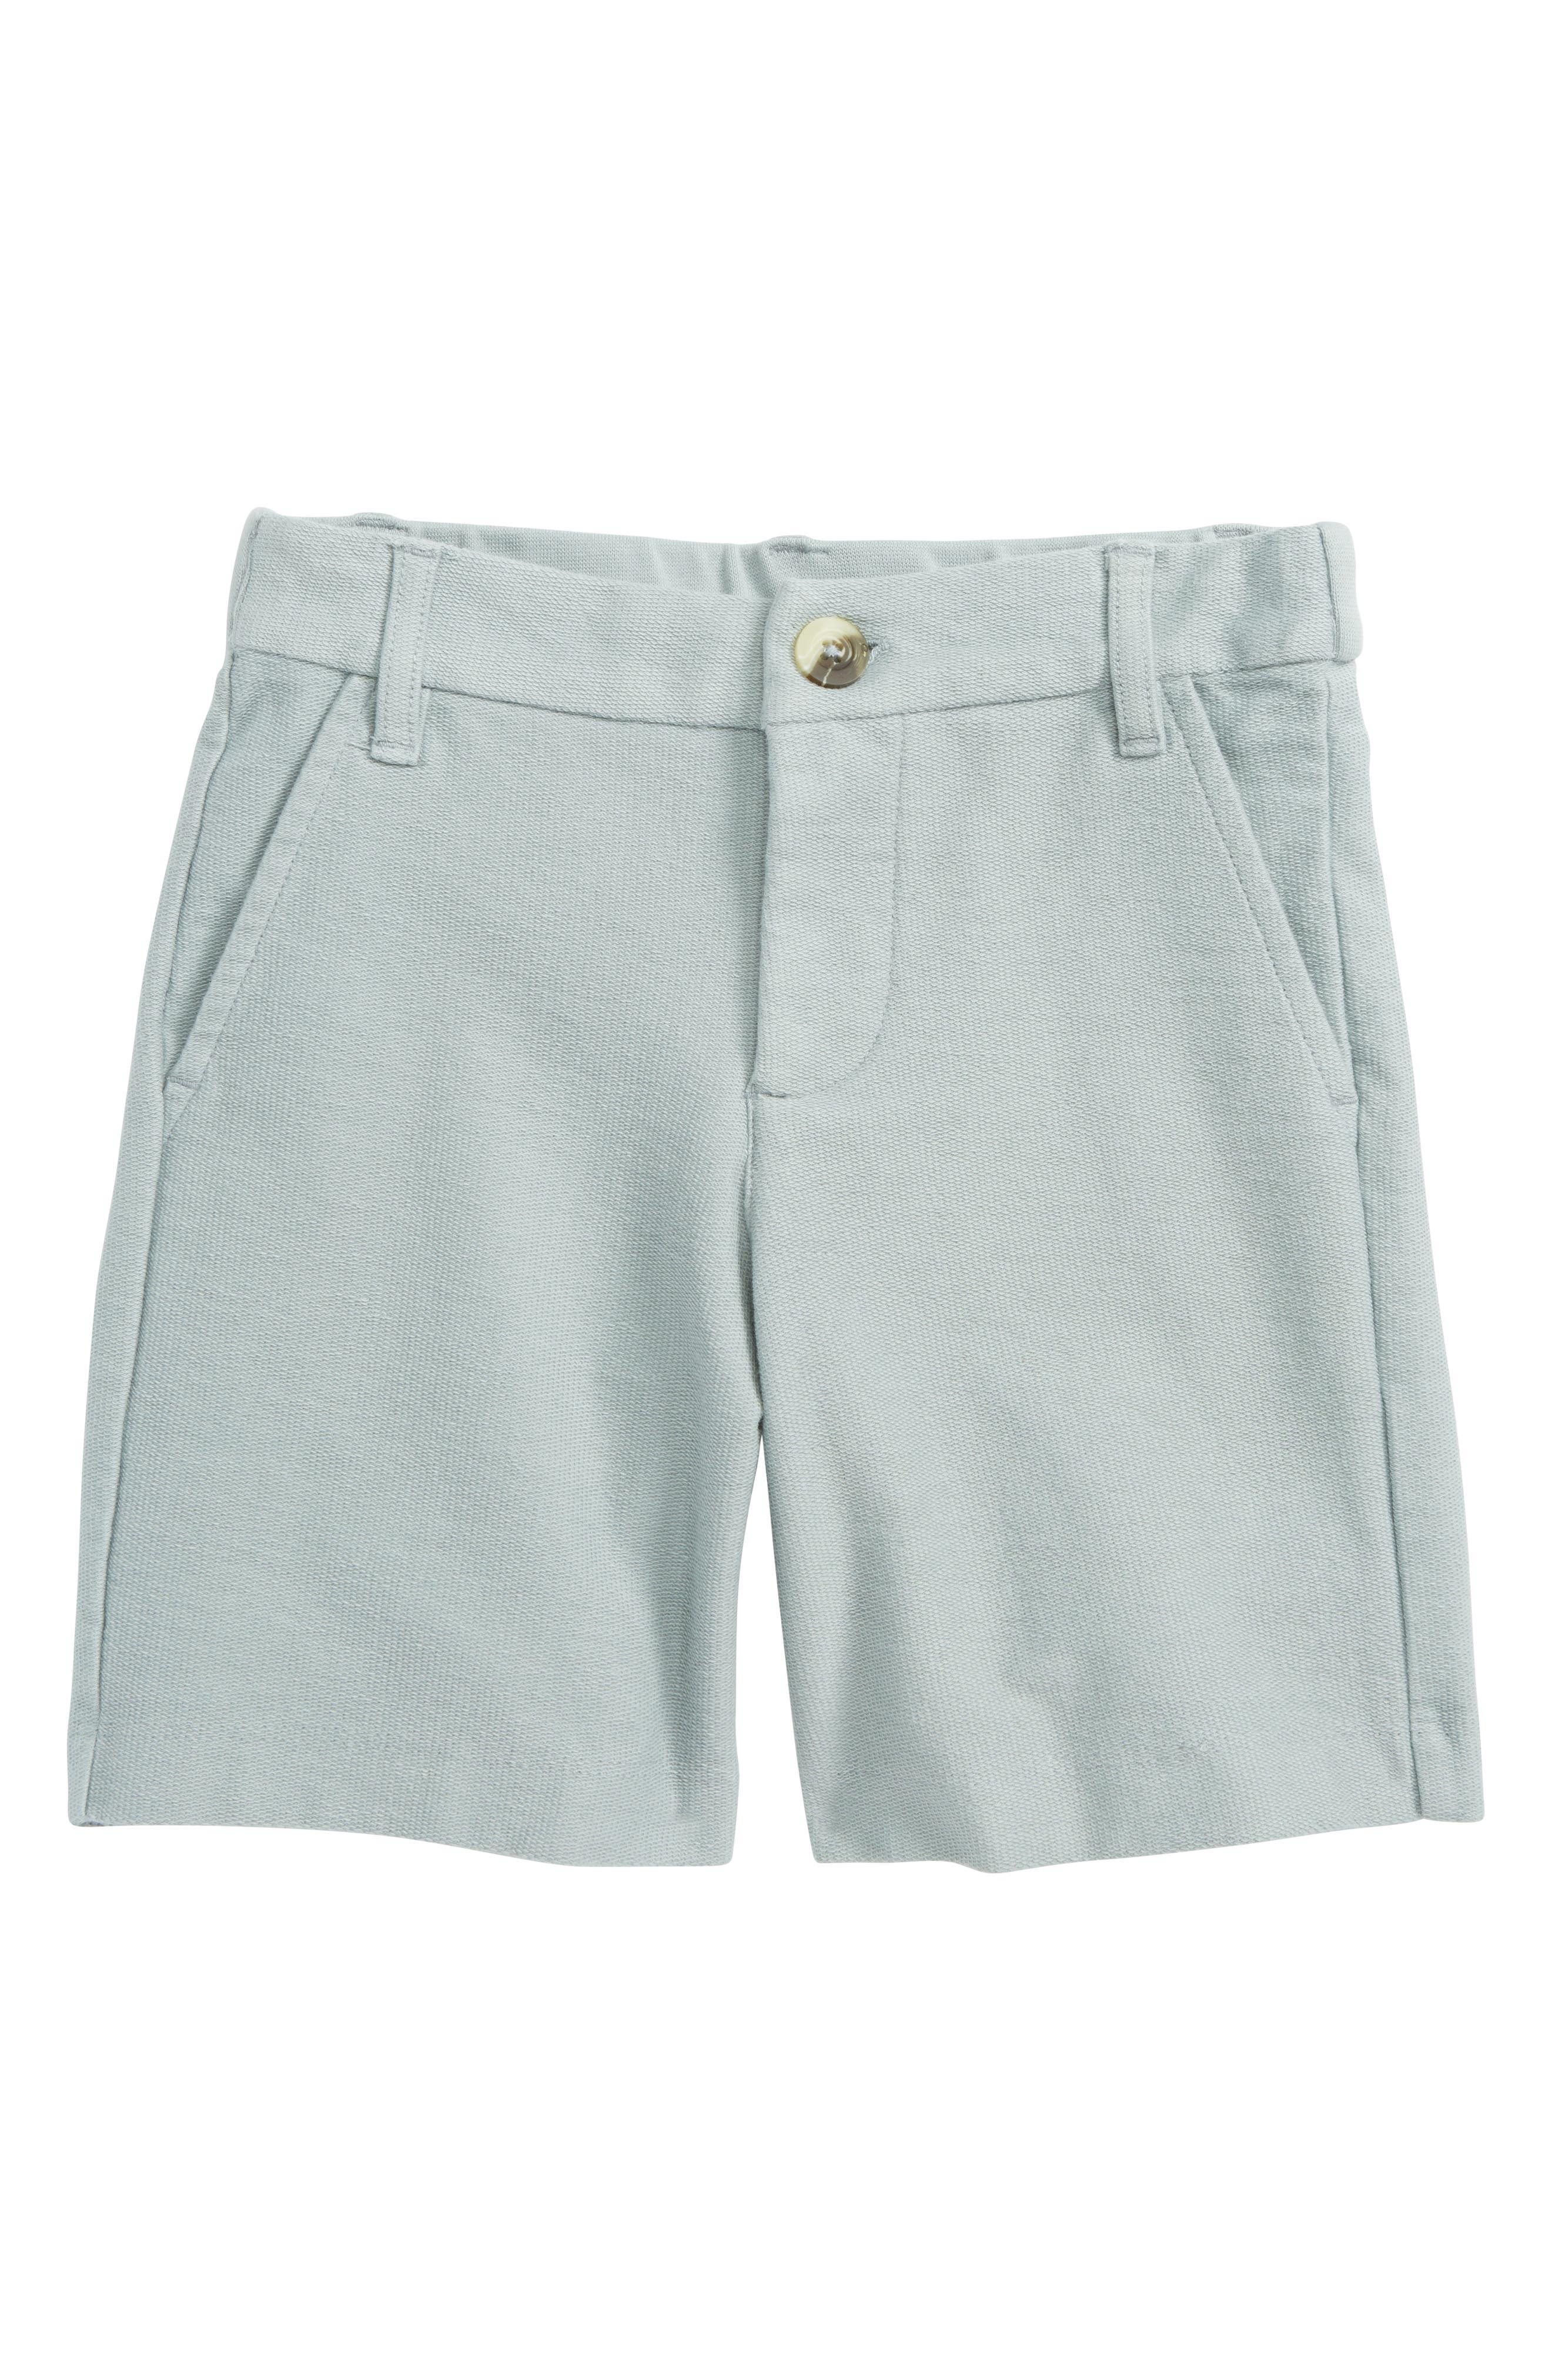 Easton Shorts,                         Main,                         color, Seafoam Green